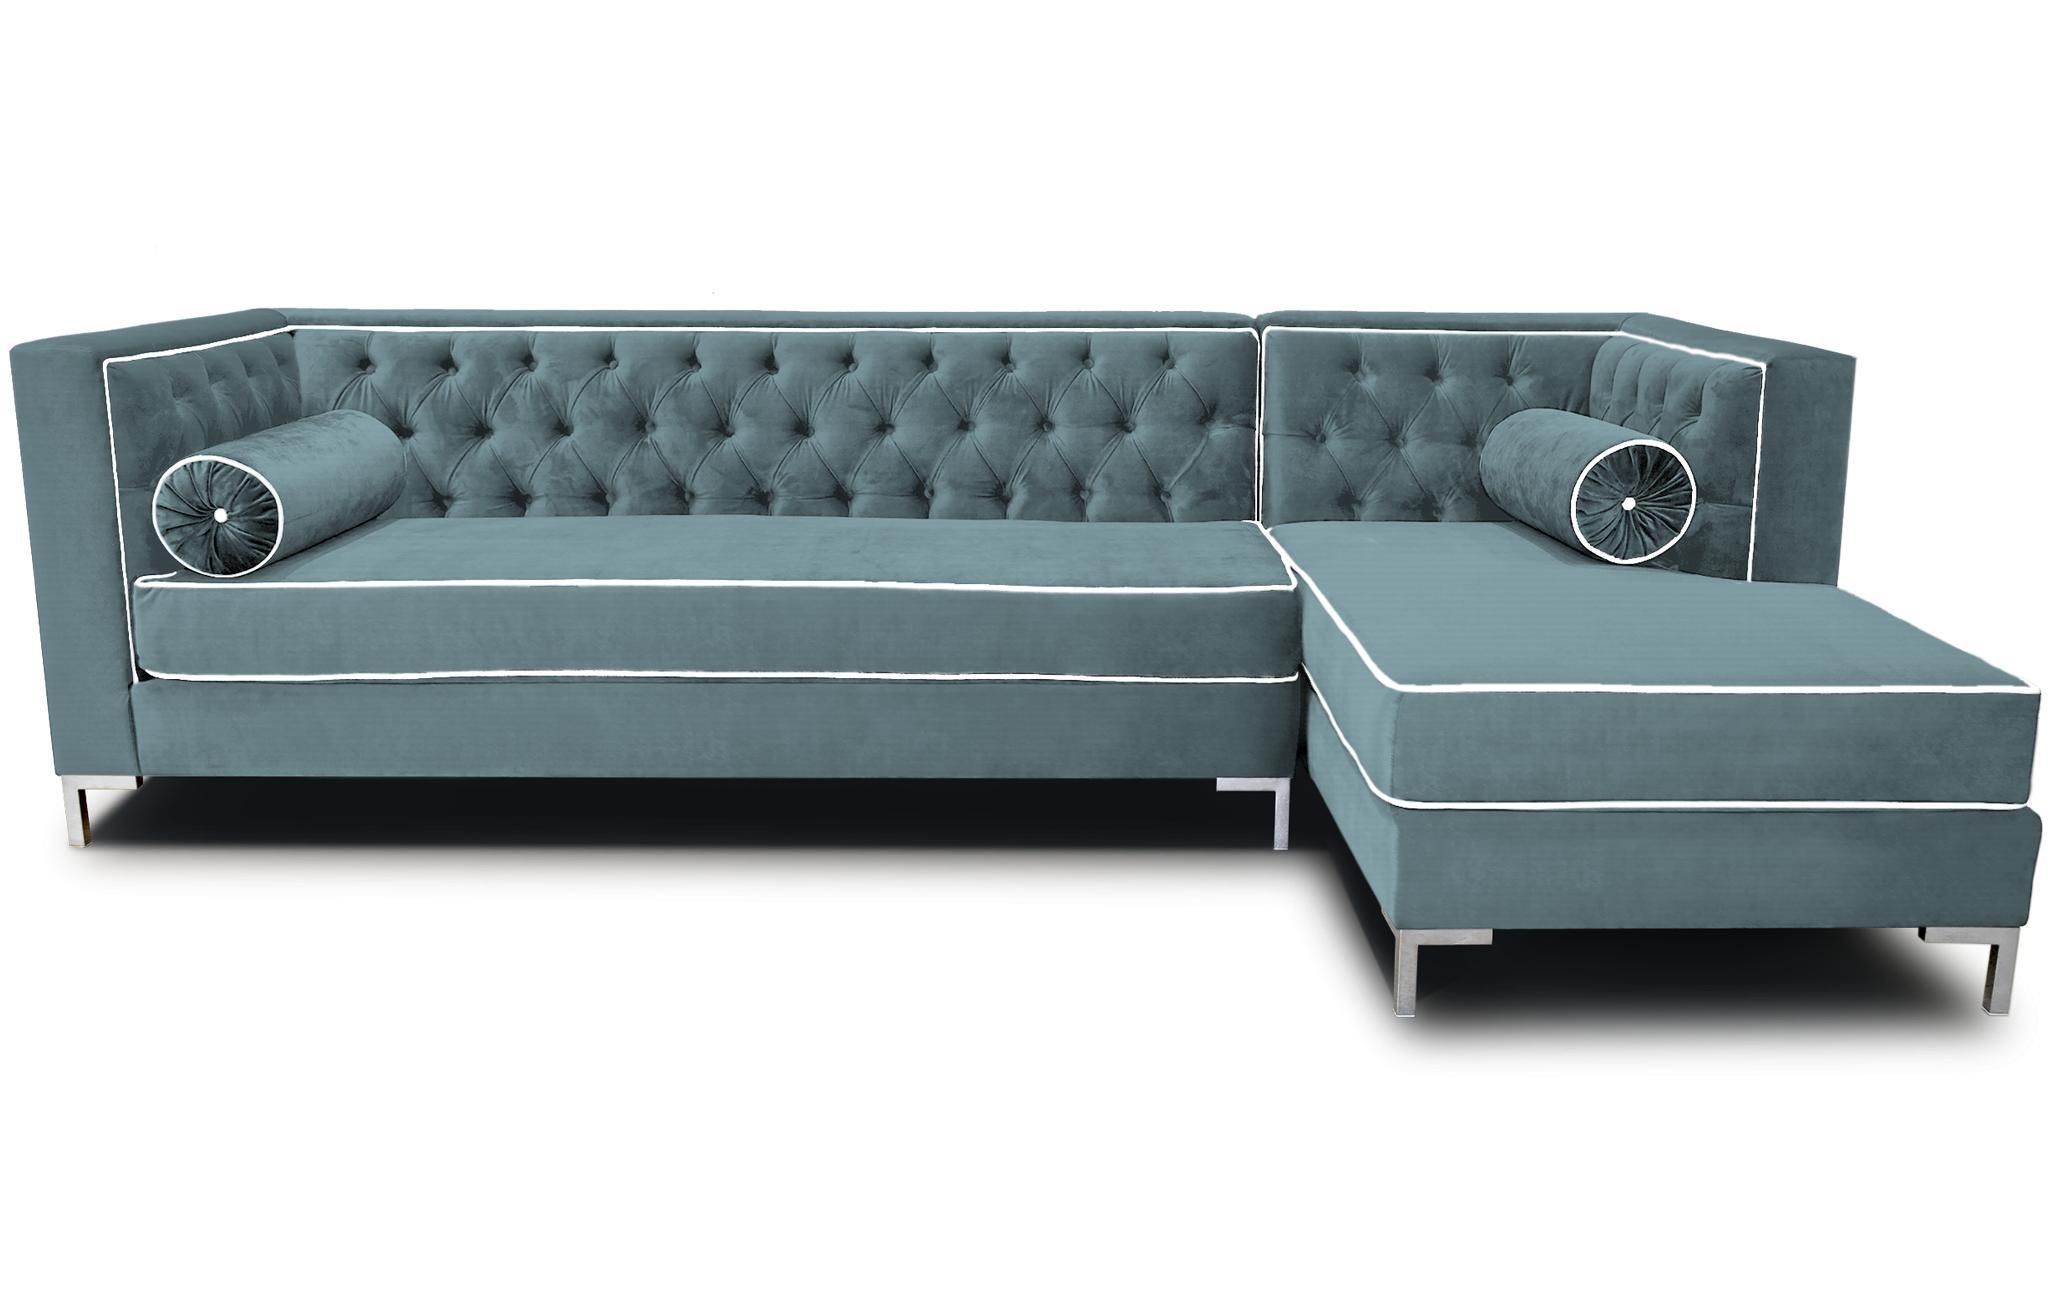 Sofas Center : 41 Stunning Tufted Sleeper Sofa Photo Design Tufted Intended For Ava Tufted Sleeper Sofas (View 15 of 20)